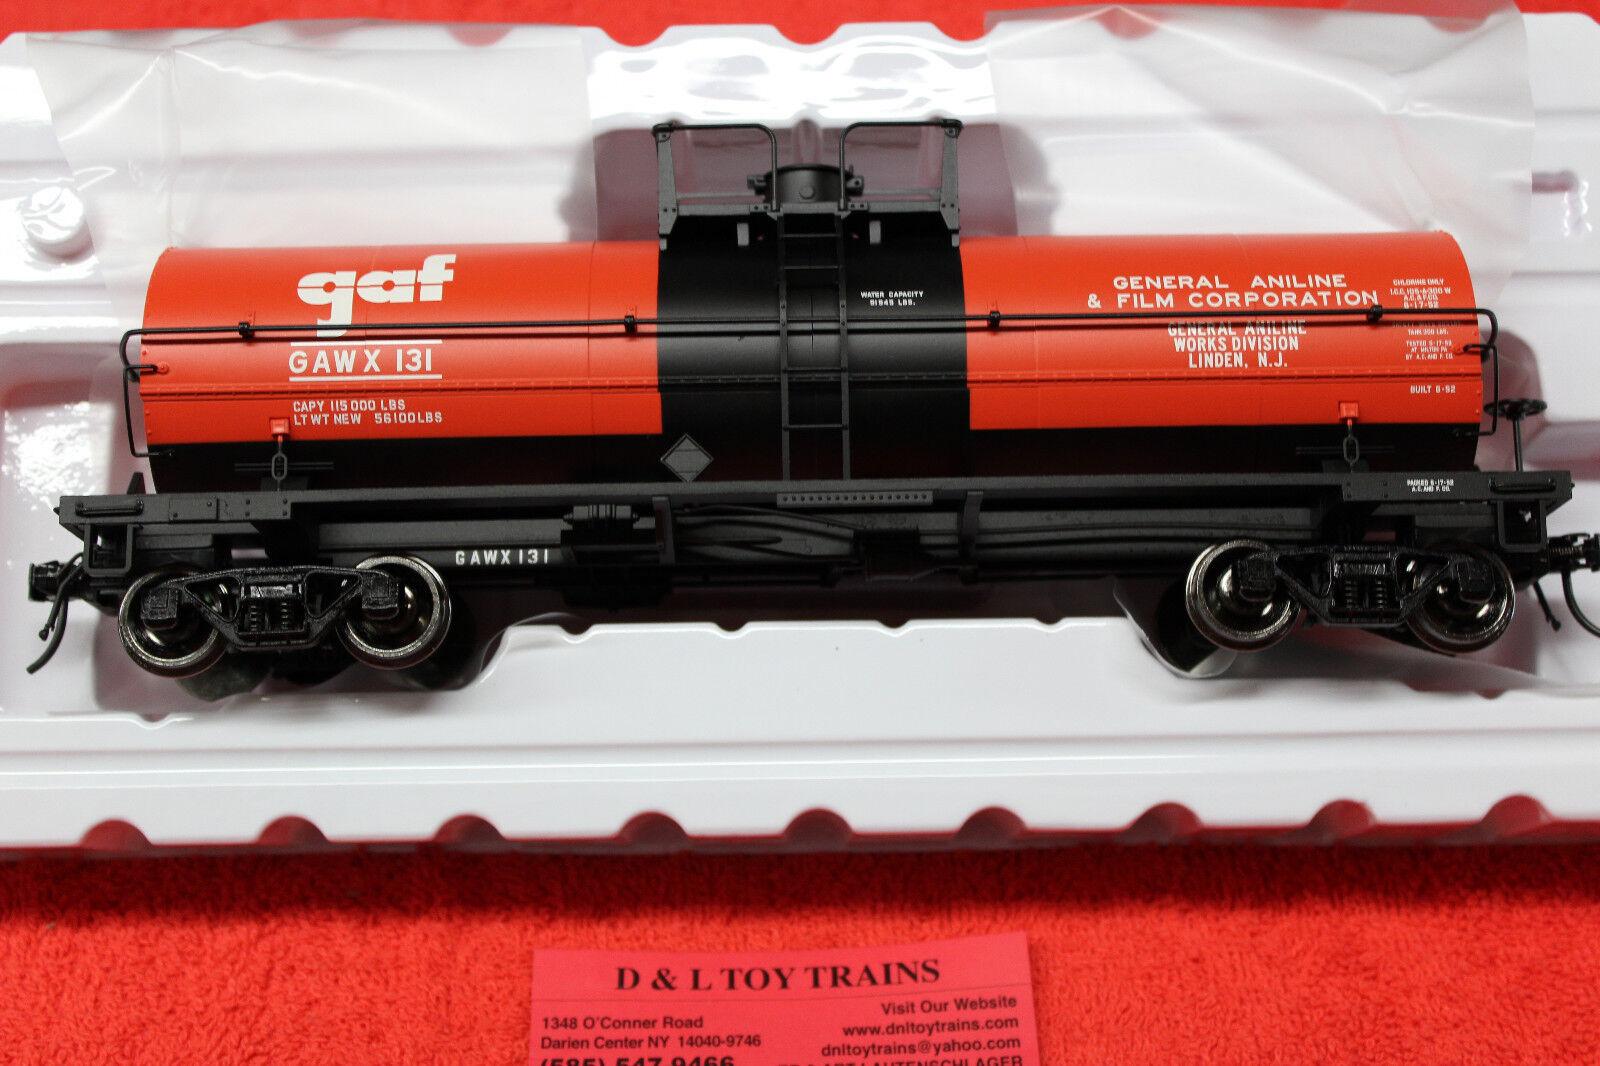 3006510 GAF Linden NJ 11,000 Gallon Tank Car 2 Rail NEW IN BOX